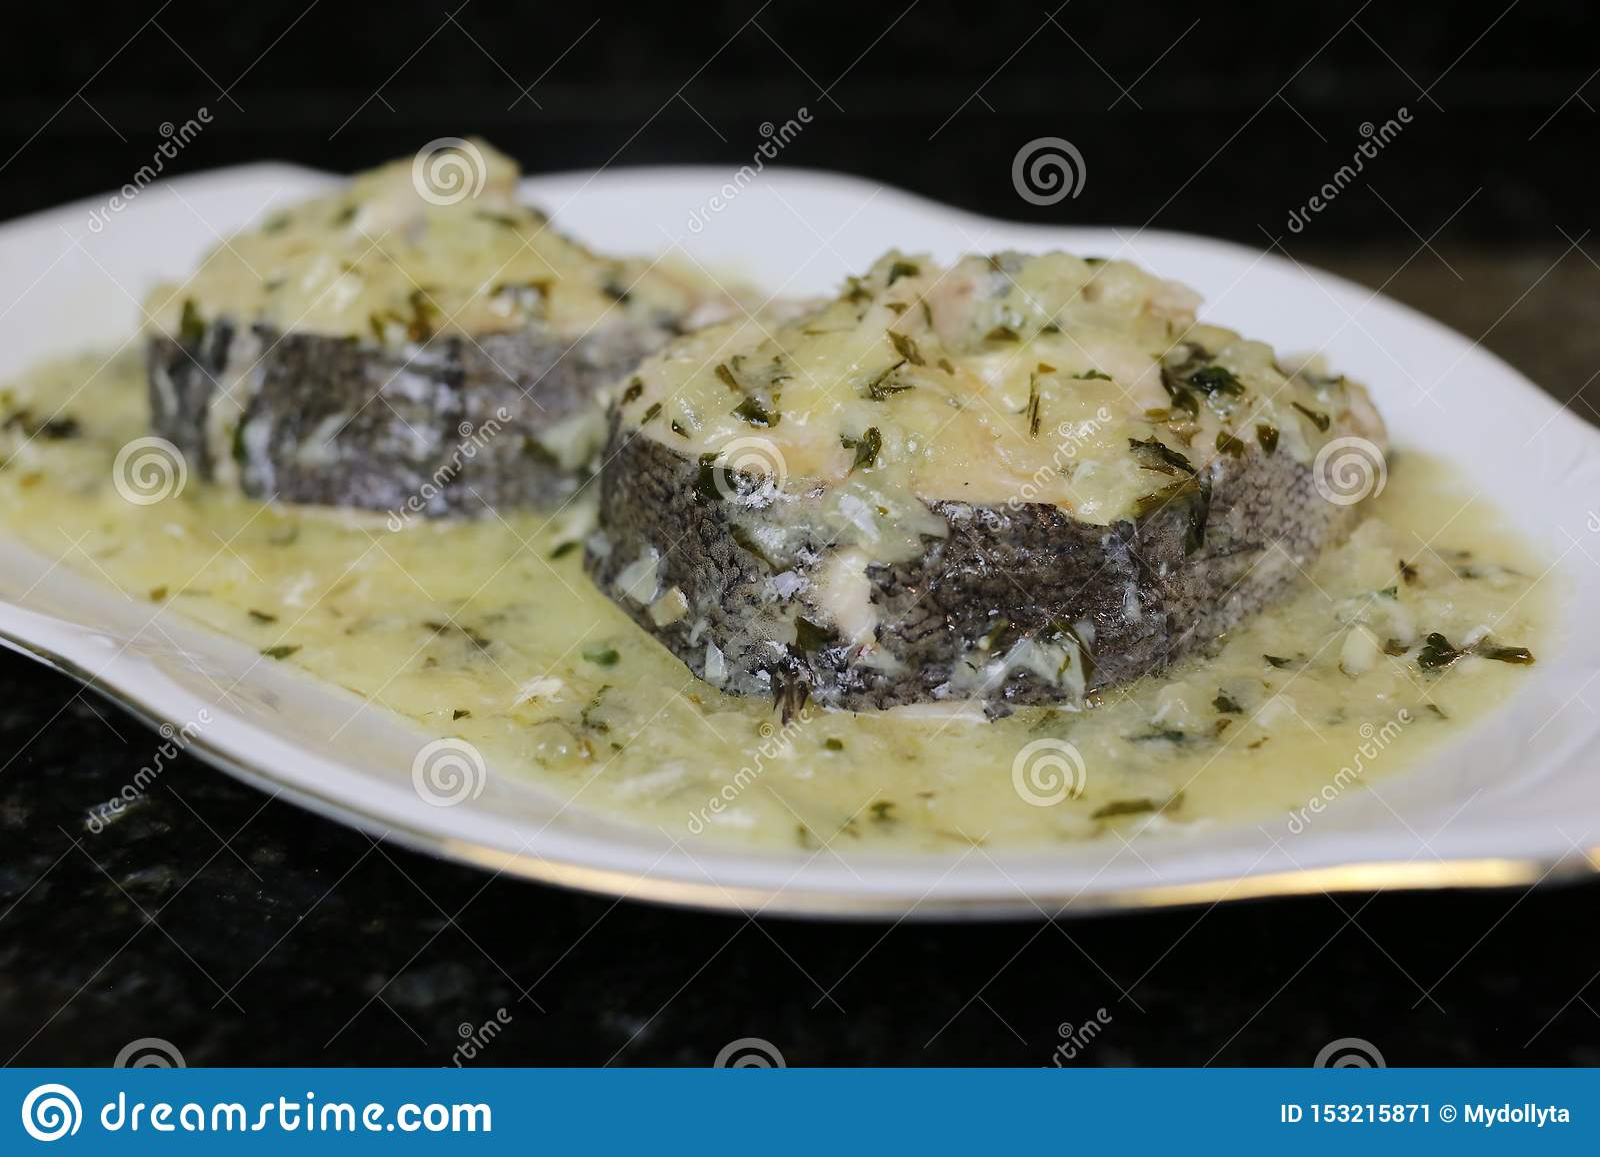 Hake in green sauce a very popular fish dish